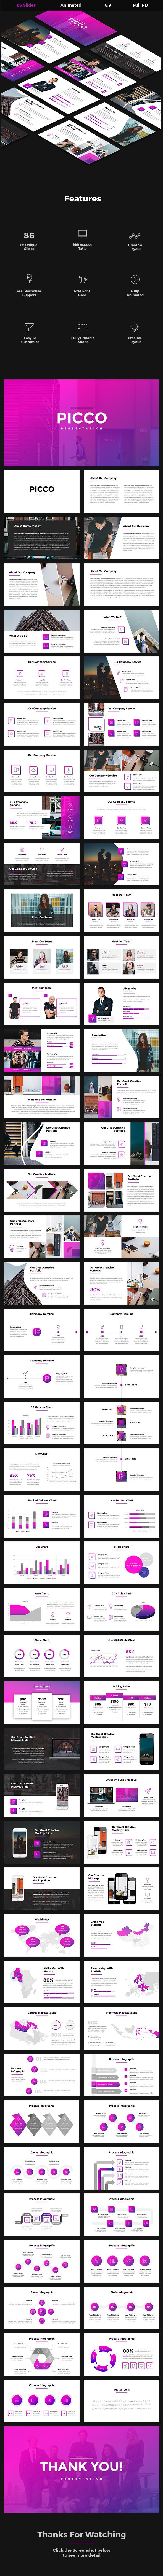 Picco - Creative Keynote Template - Creative Keynote Templates